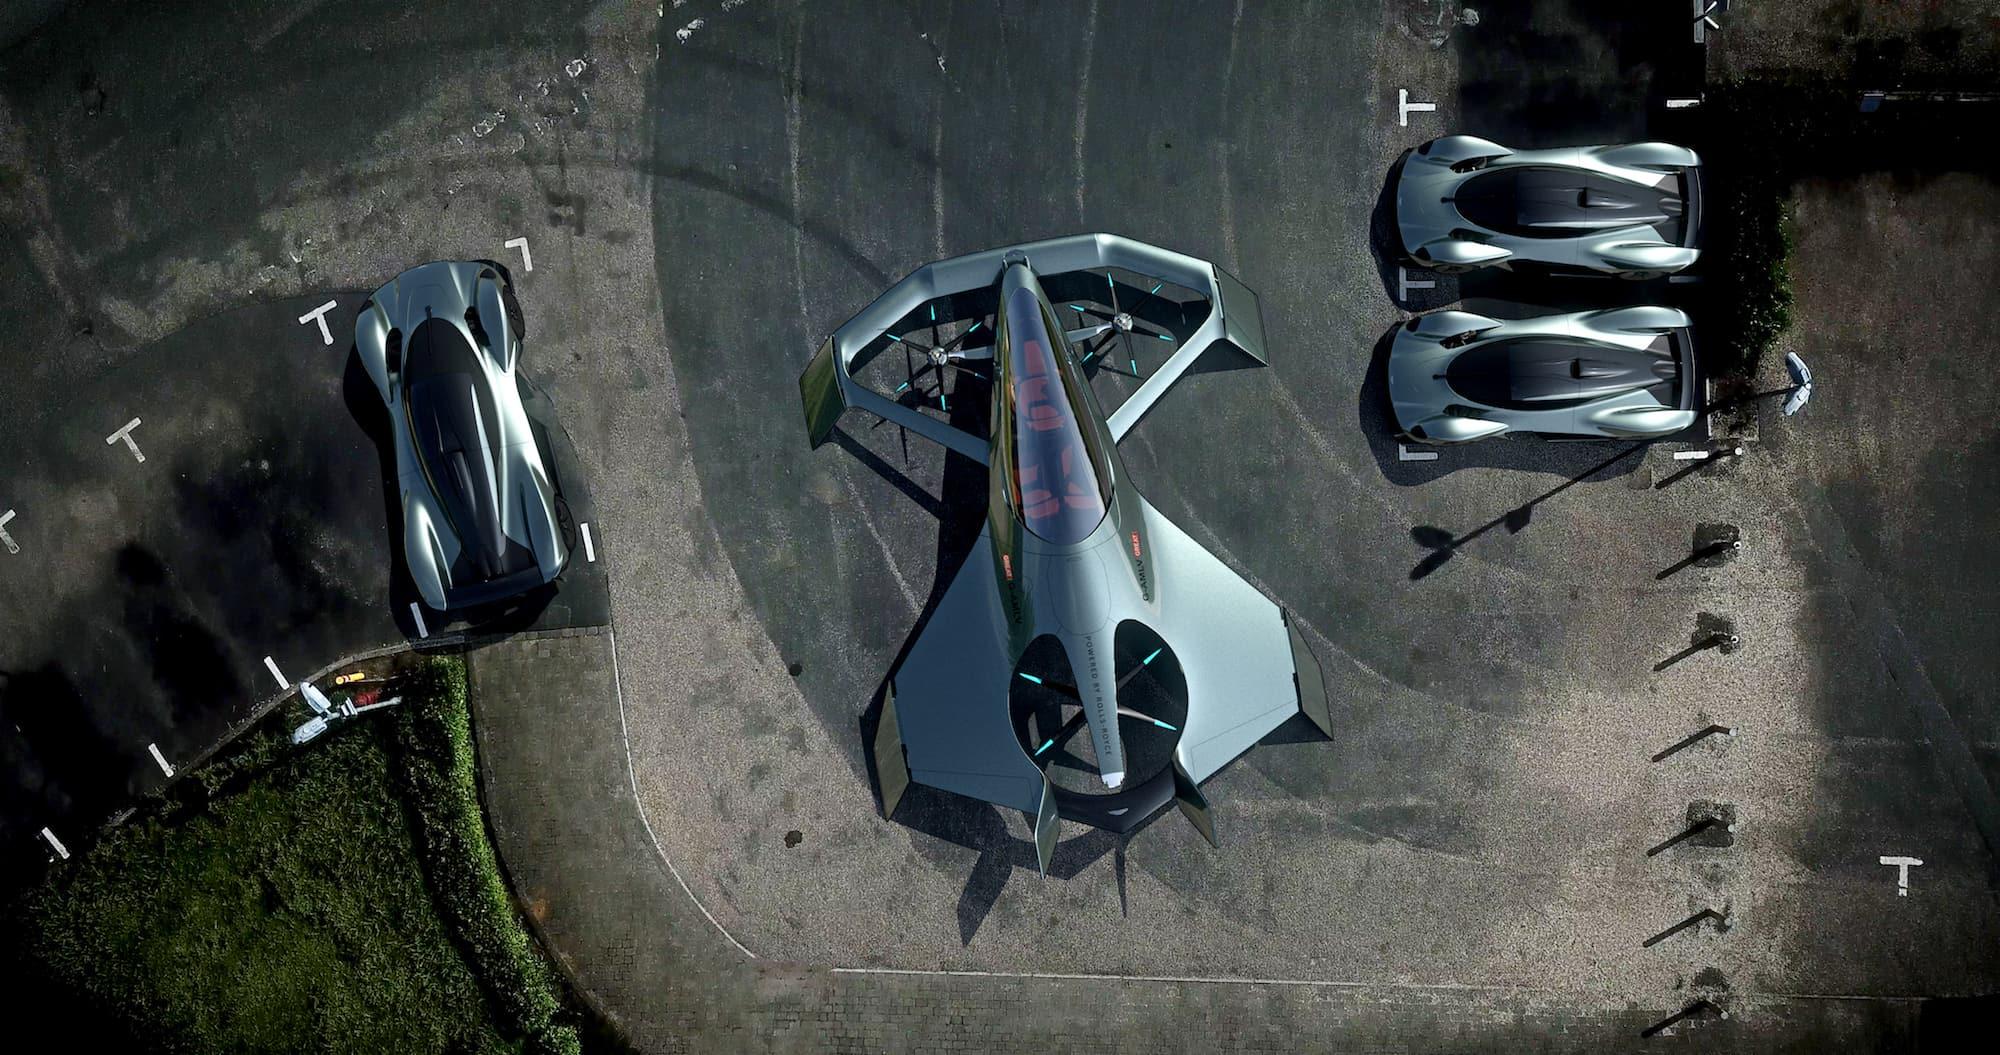 Volante Vision Concept Erobert Aston Martin Bald Auch Noch Den Himmel